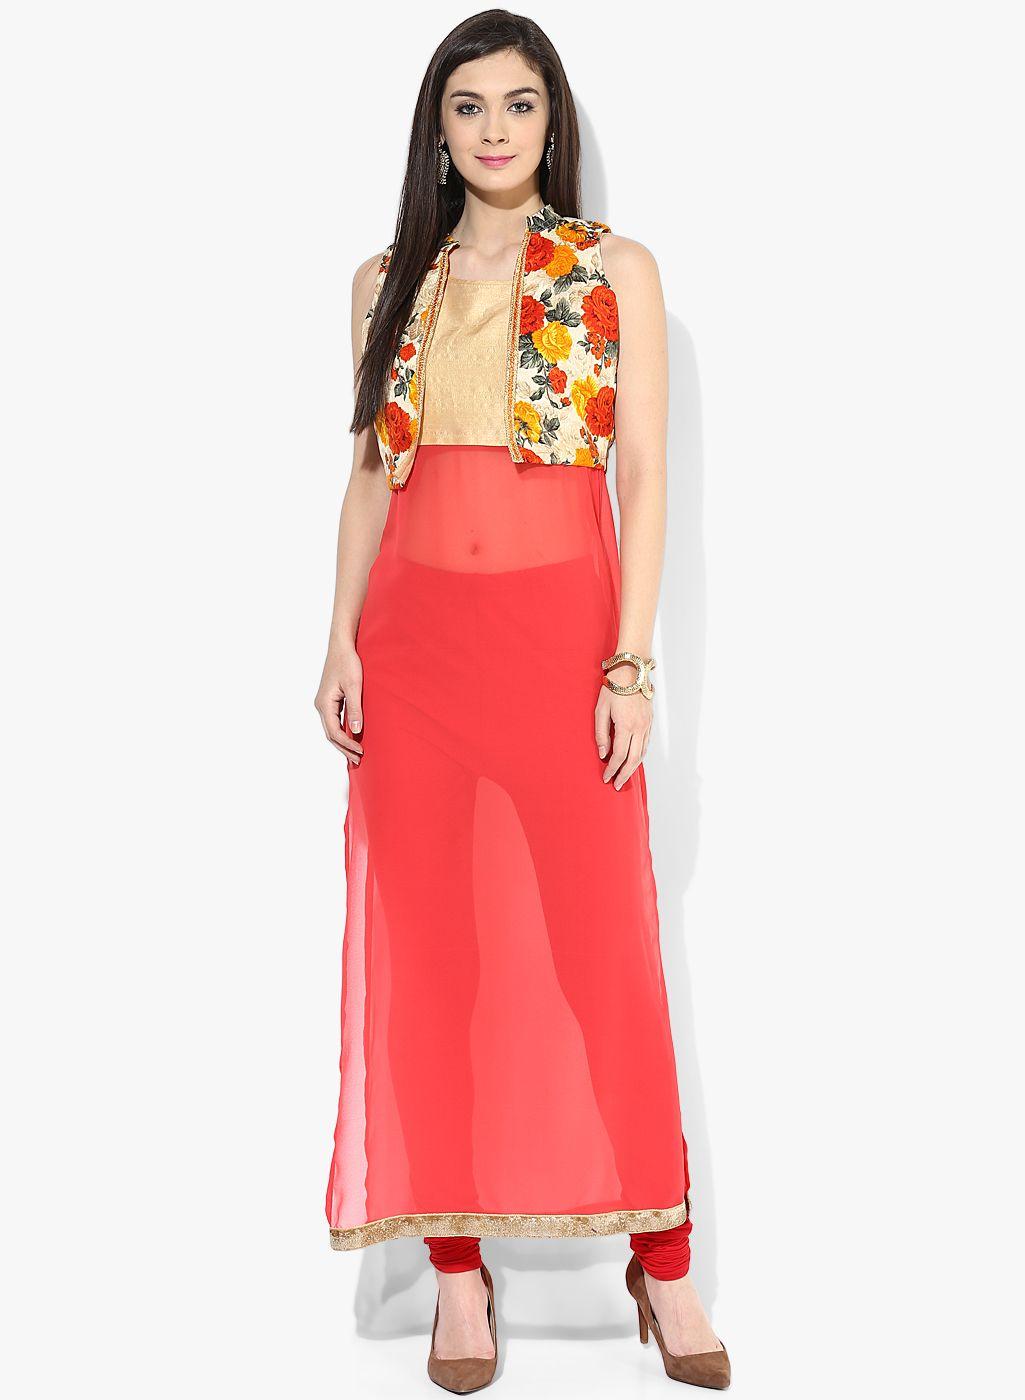 e1fdacd801 Raindrops Orange And Beige Embellished Kurti With Koti @ Looksgud.in  #Ethnic #Designer #Raindrops #Kurti #Orange #IndianWear